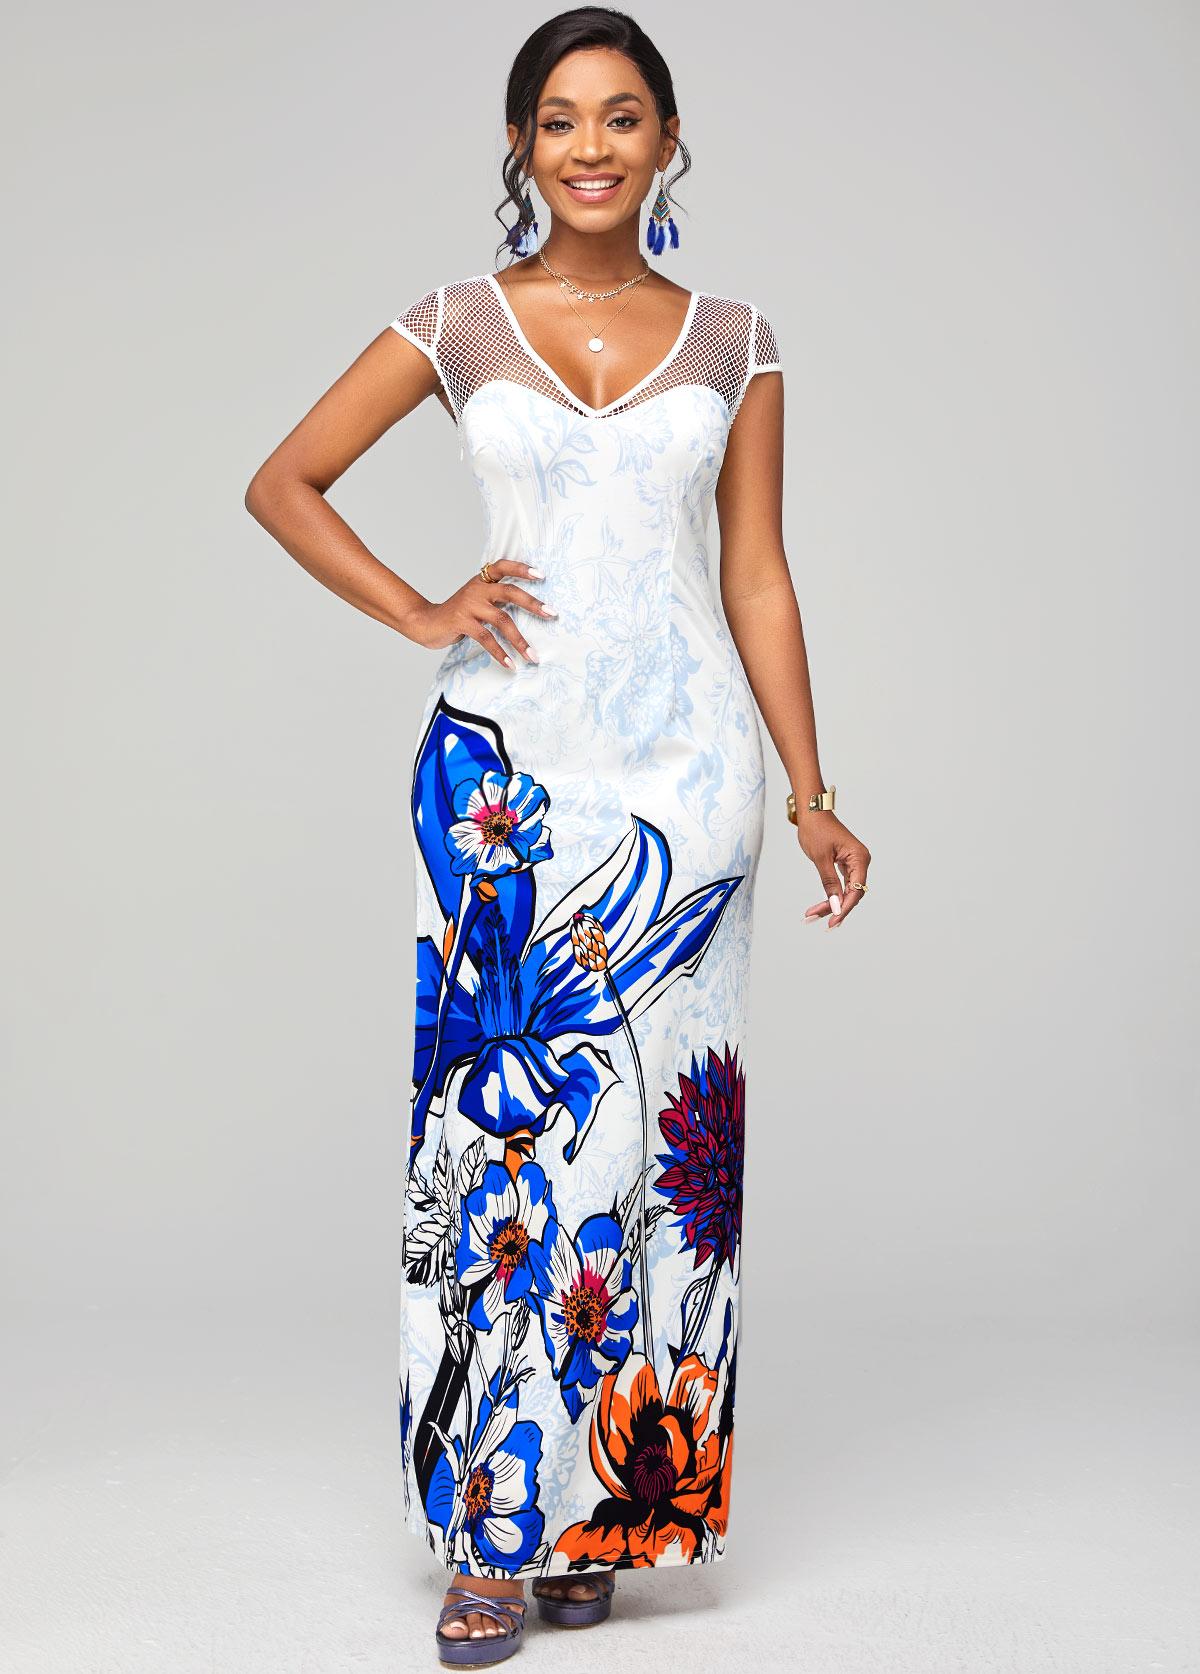 Fishnet Panel Floral Print Short Sleeve Dress